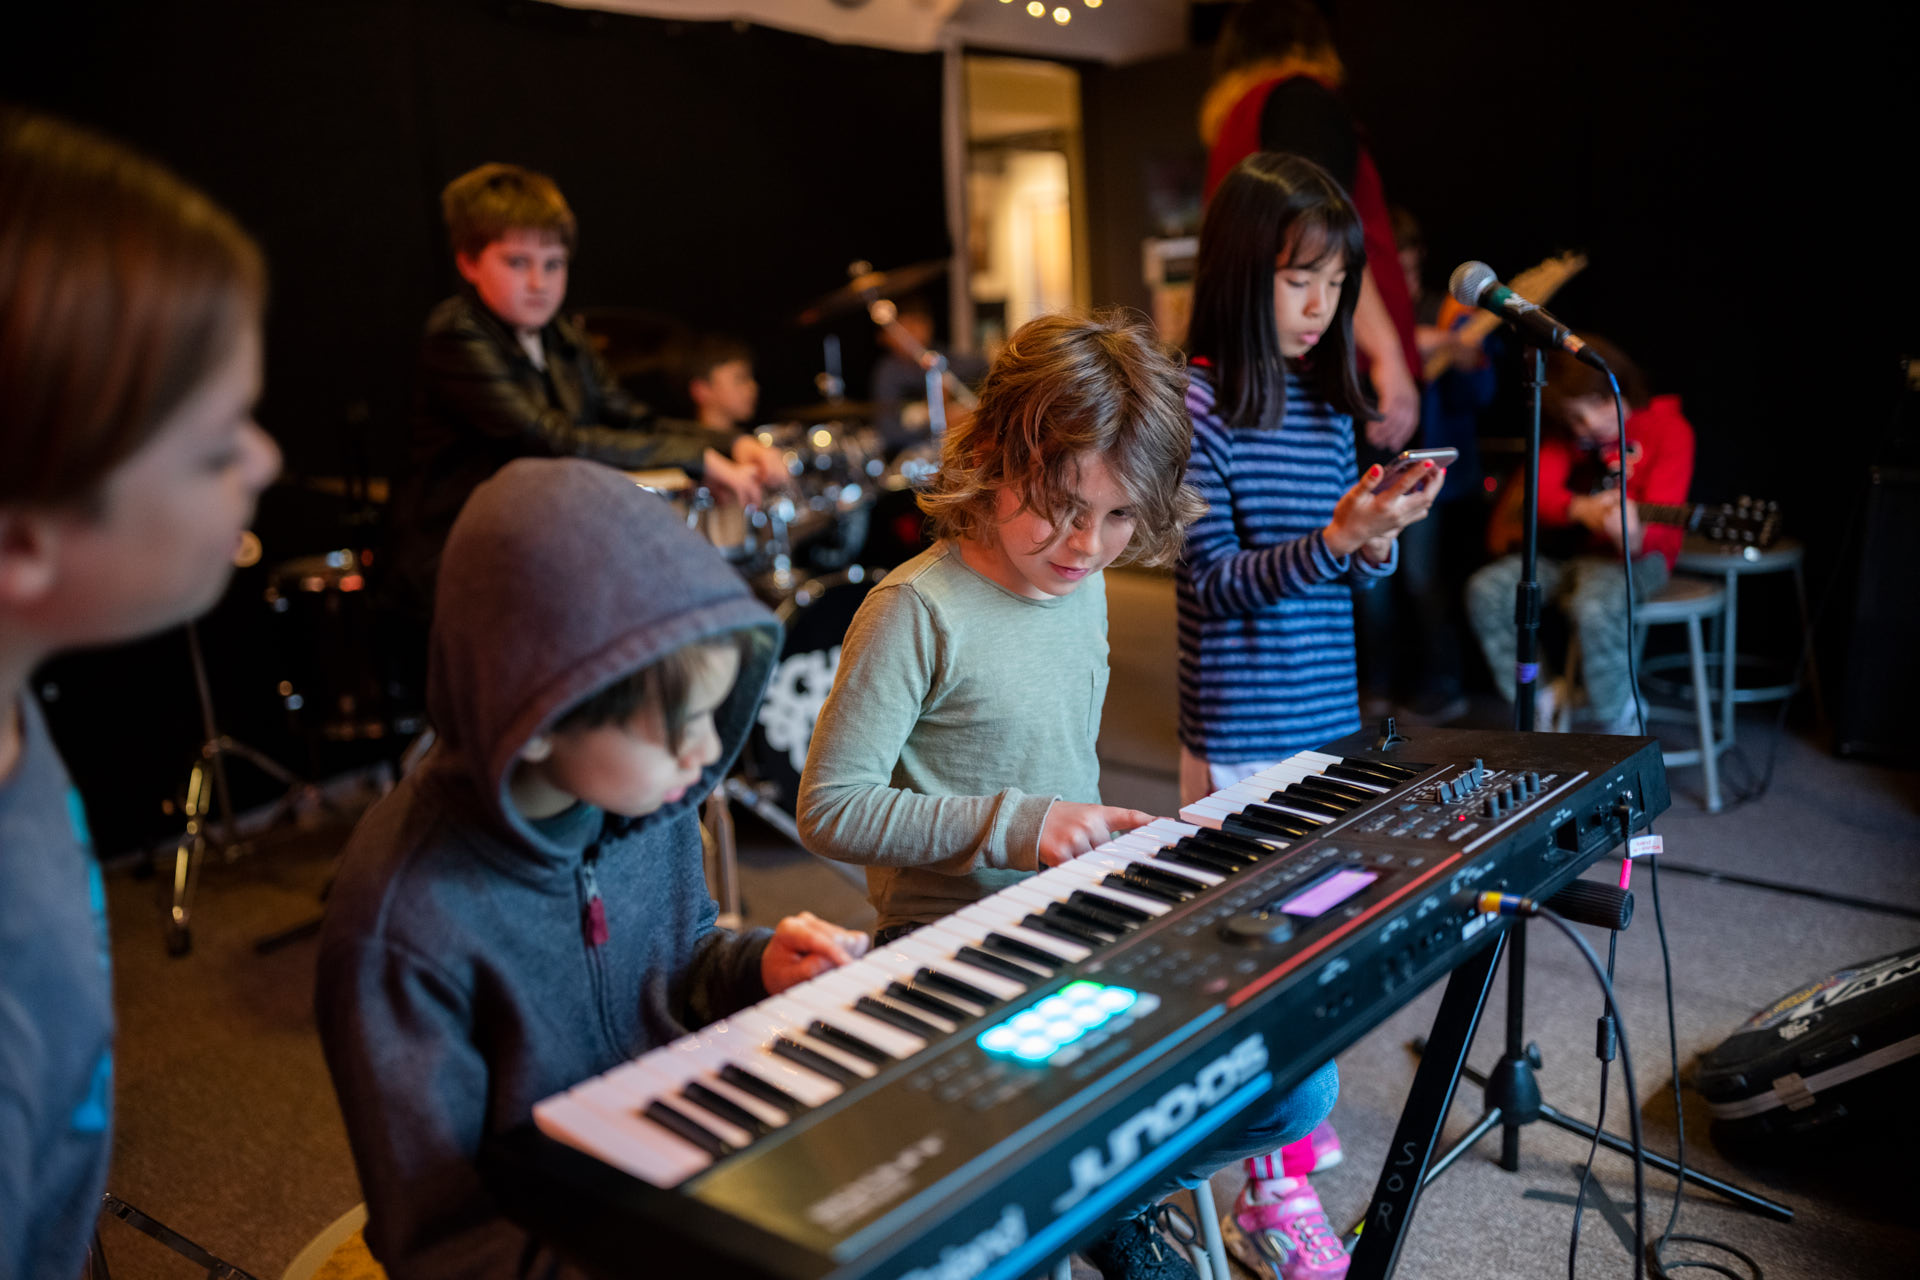 school-of-rock-teaches-the-universal-language-of-music-4